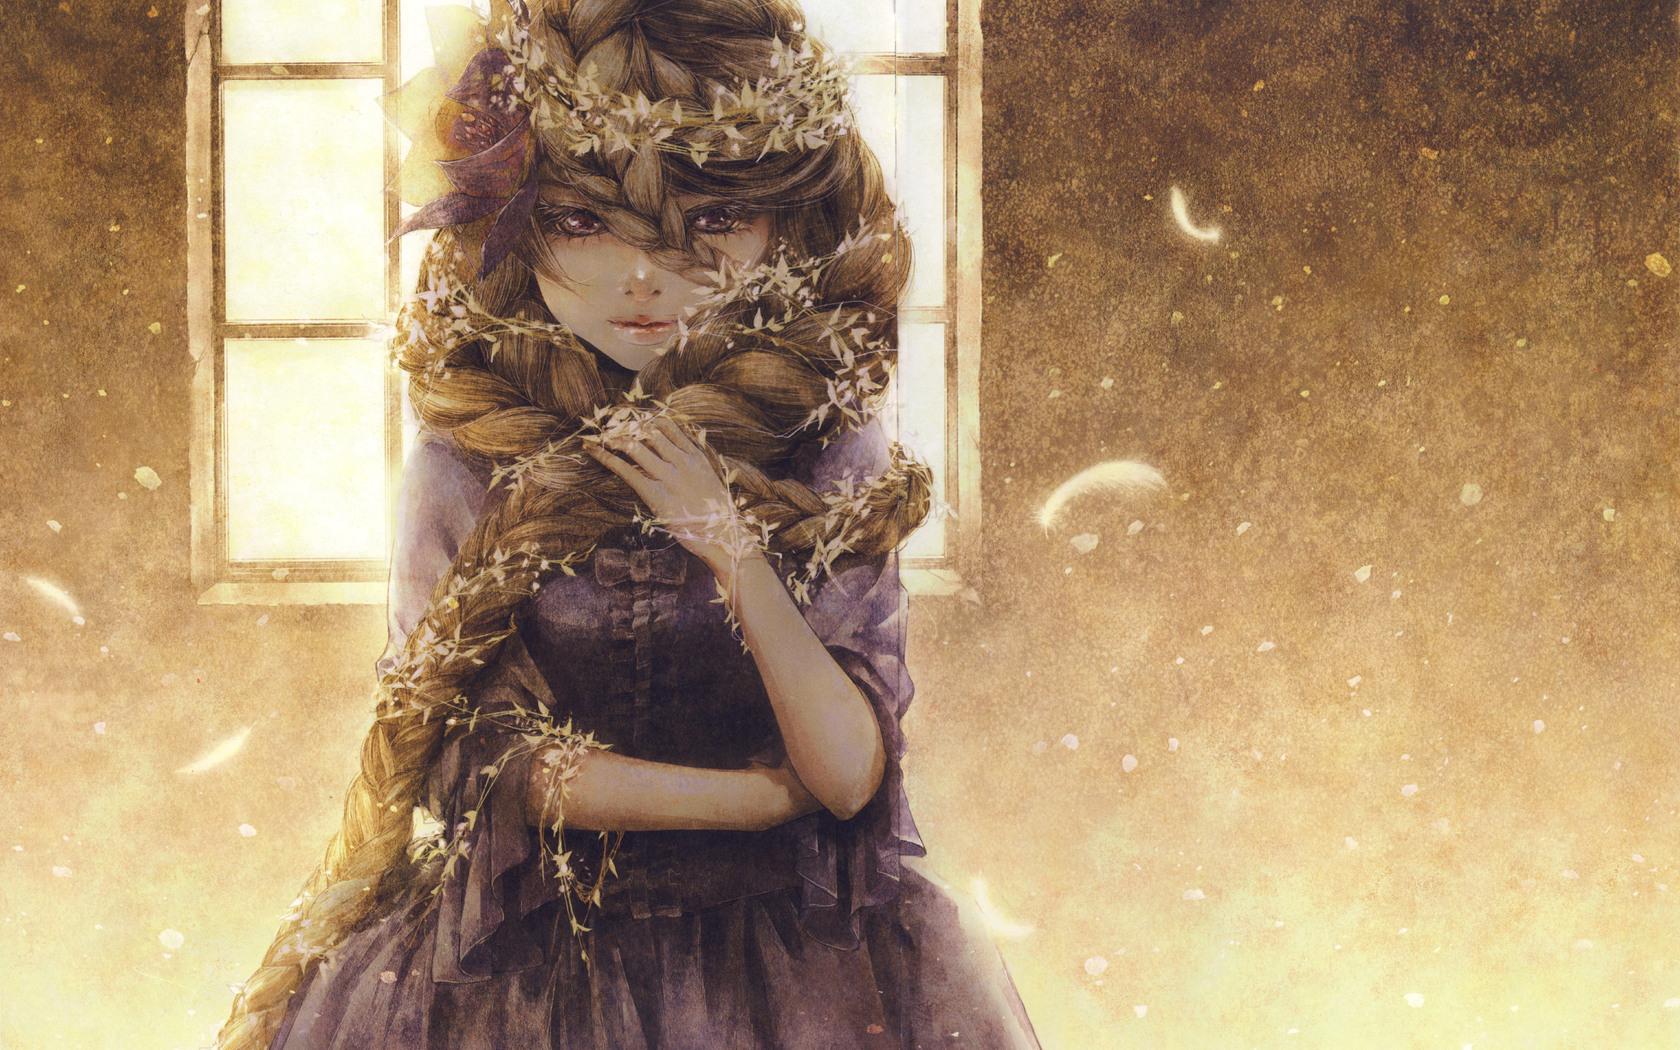 purple-eyes-long-hair-artistic-girl-4w.jpg